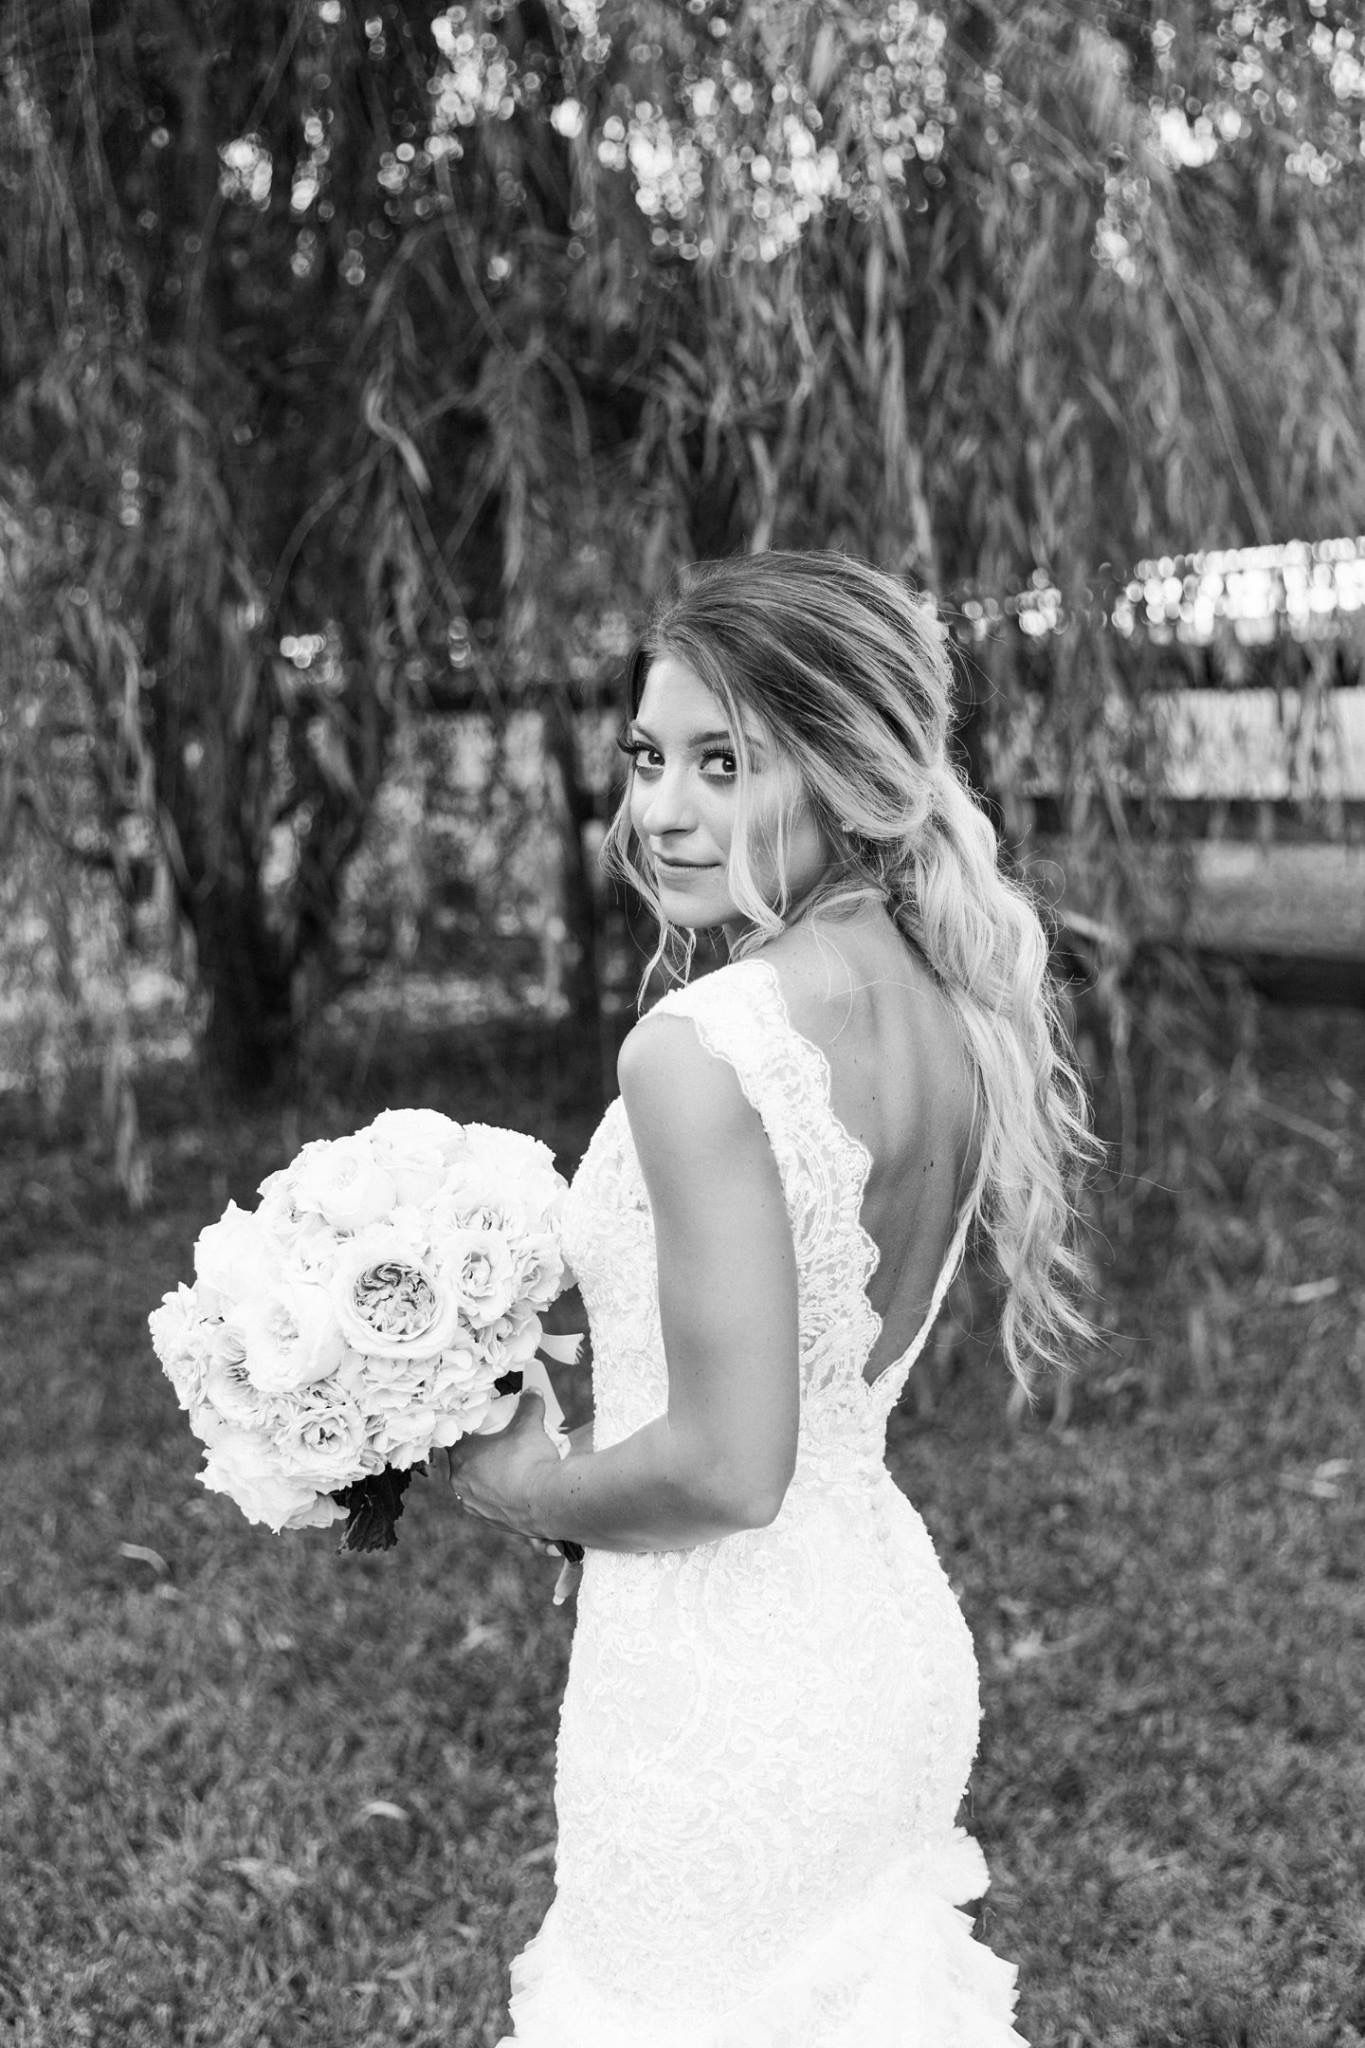 Bridal ponytail hairstylelacewedding lace weddings